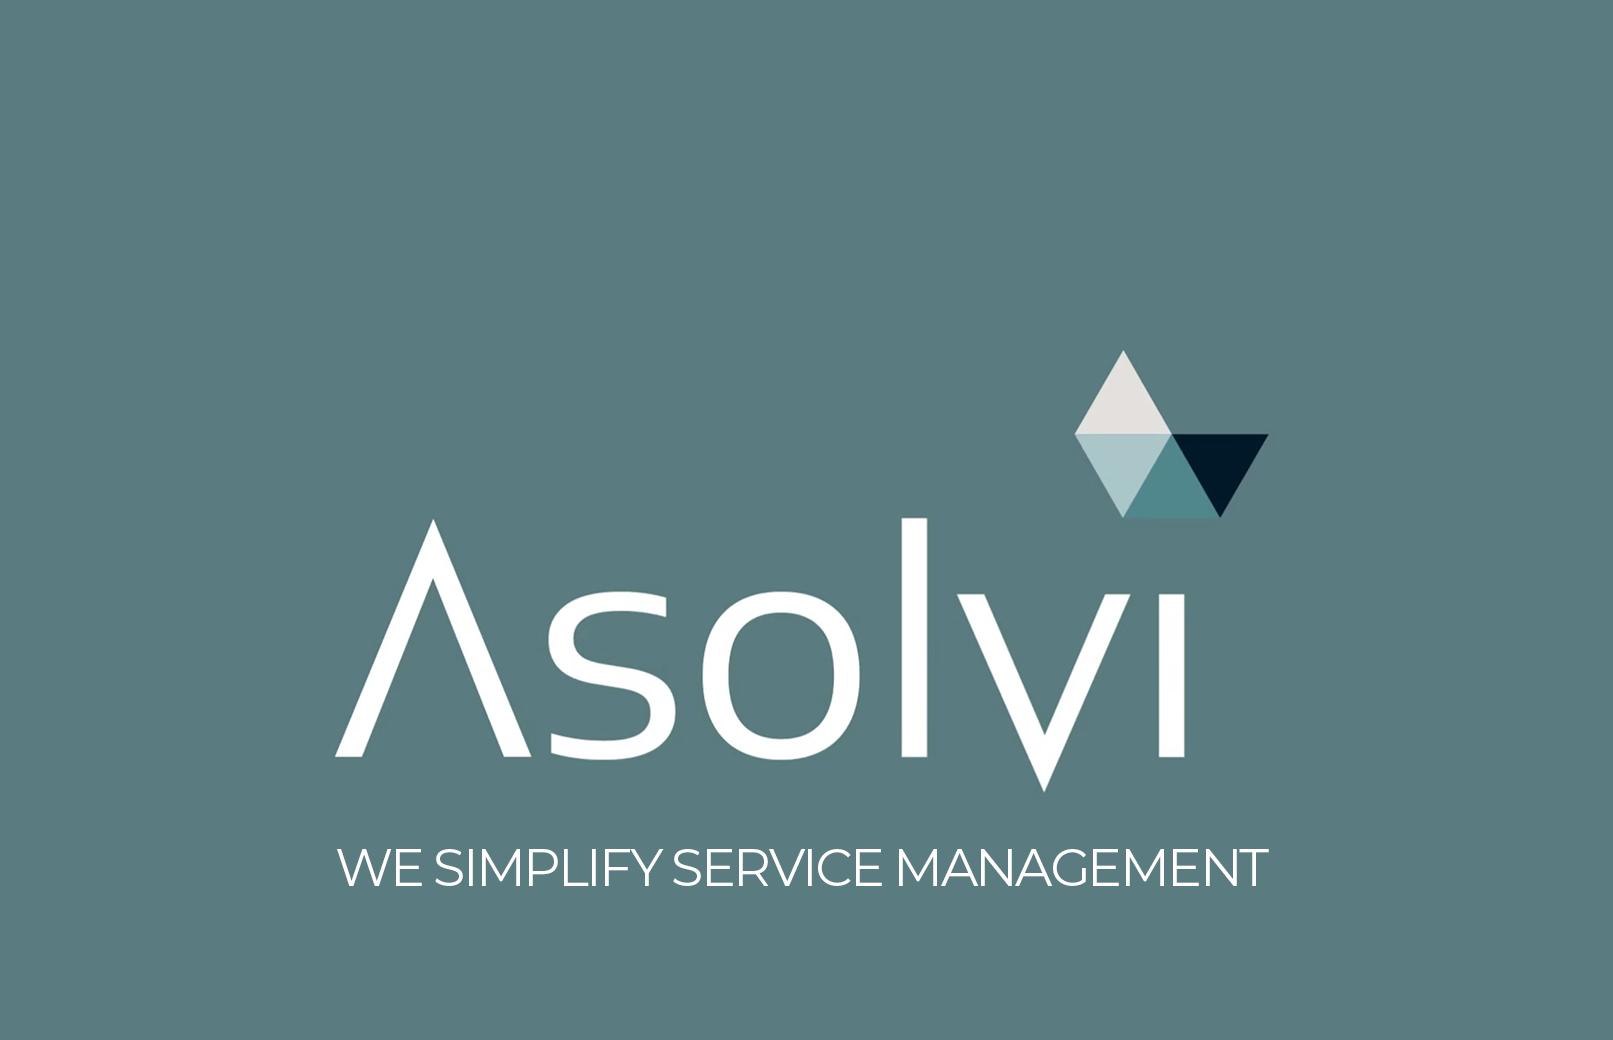 Asolvi - We Simplify Service Management